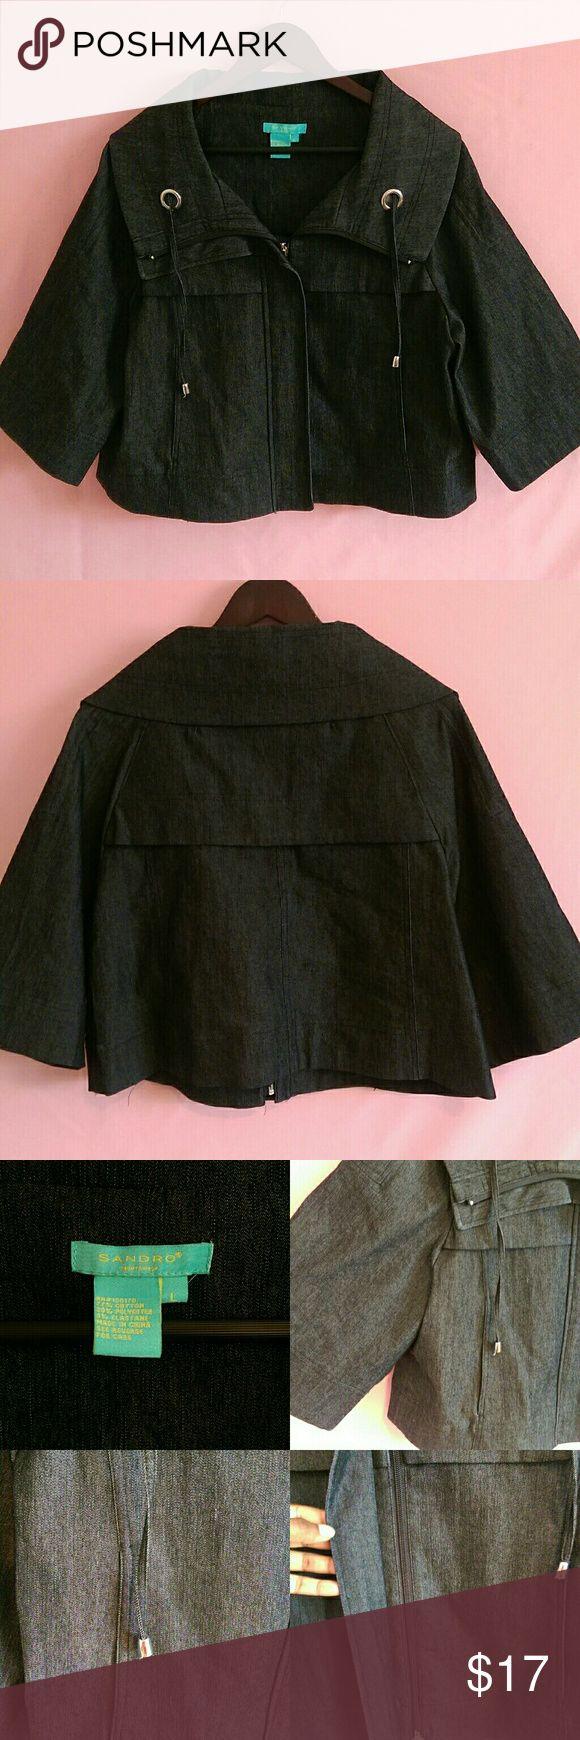 Large Pretty Dark Denim Jacket Pretty Dark Denim Zip up jacket!   Size: Large Brand: Sandro Sandro Jackets & Coats Jean Jackets